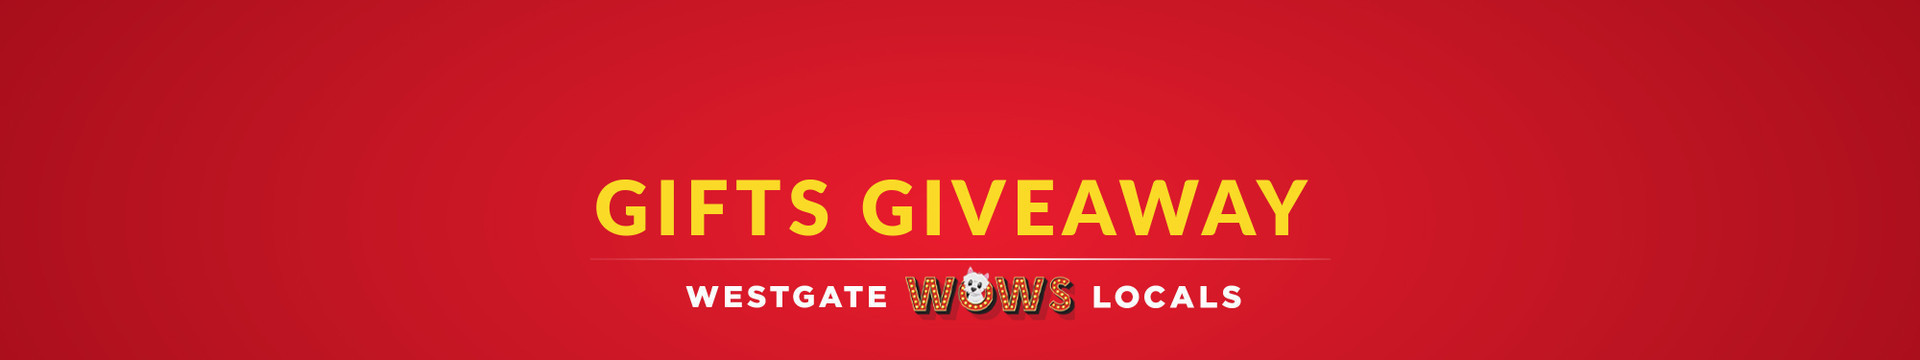 Westgate WOW Locals Gift Giveaway   Westgate Las Vegas Resort & Casino